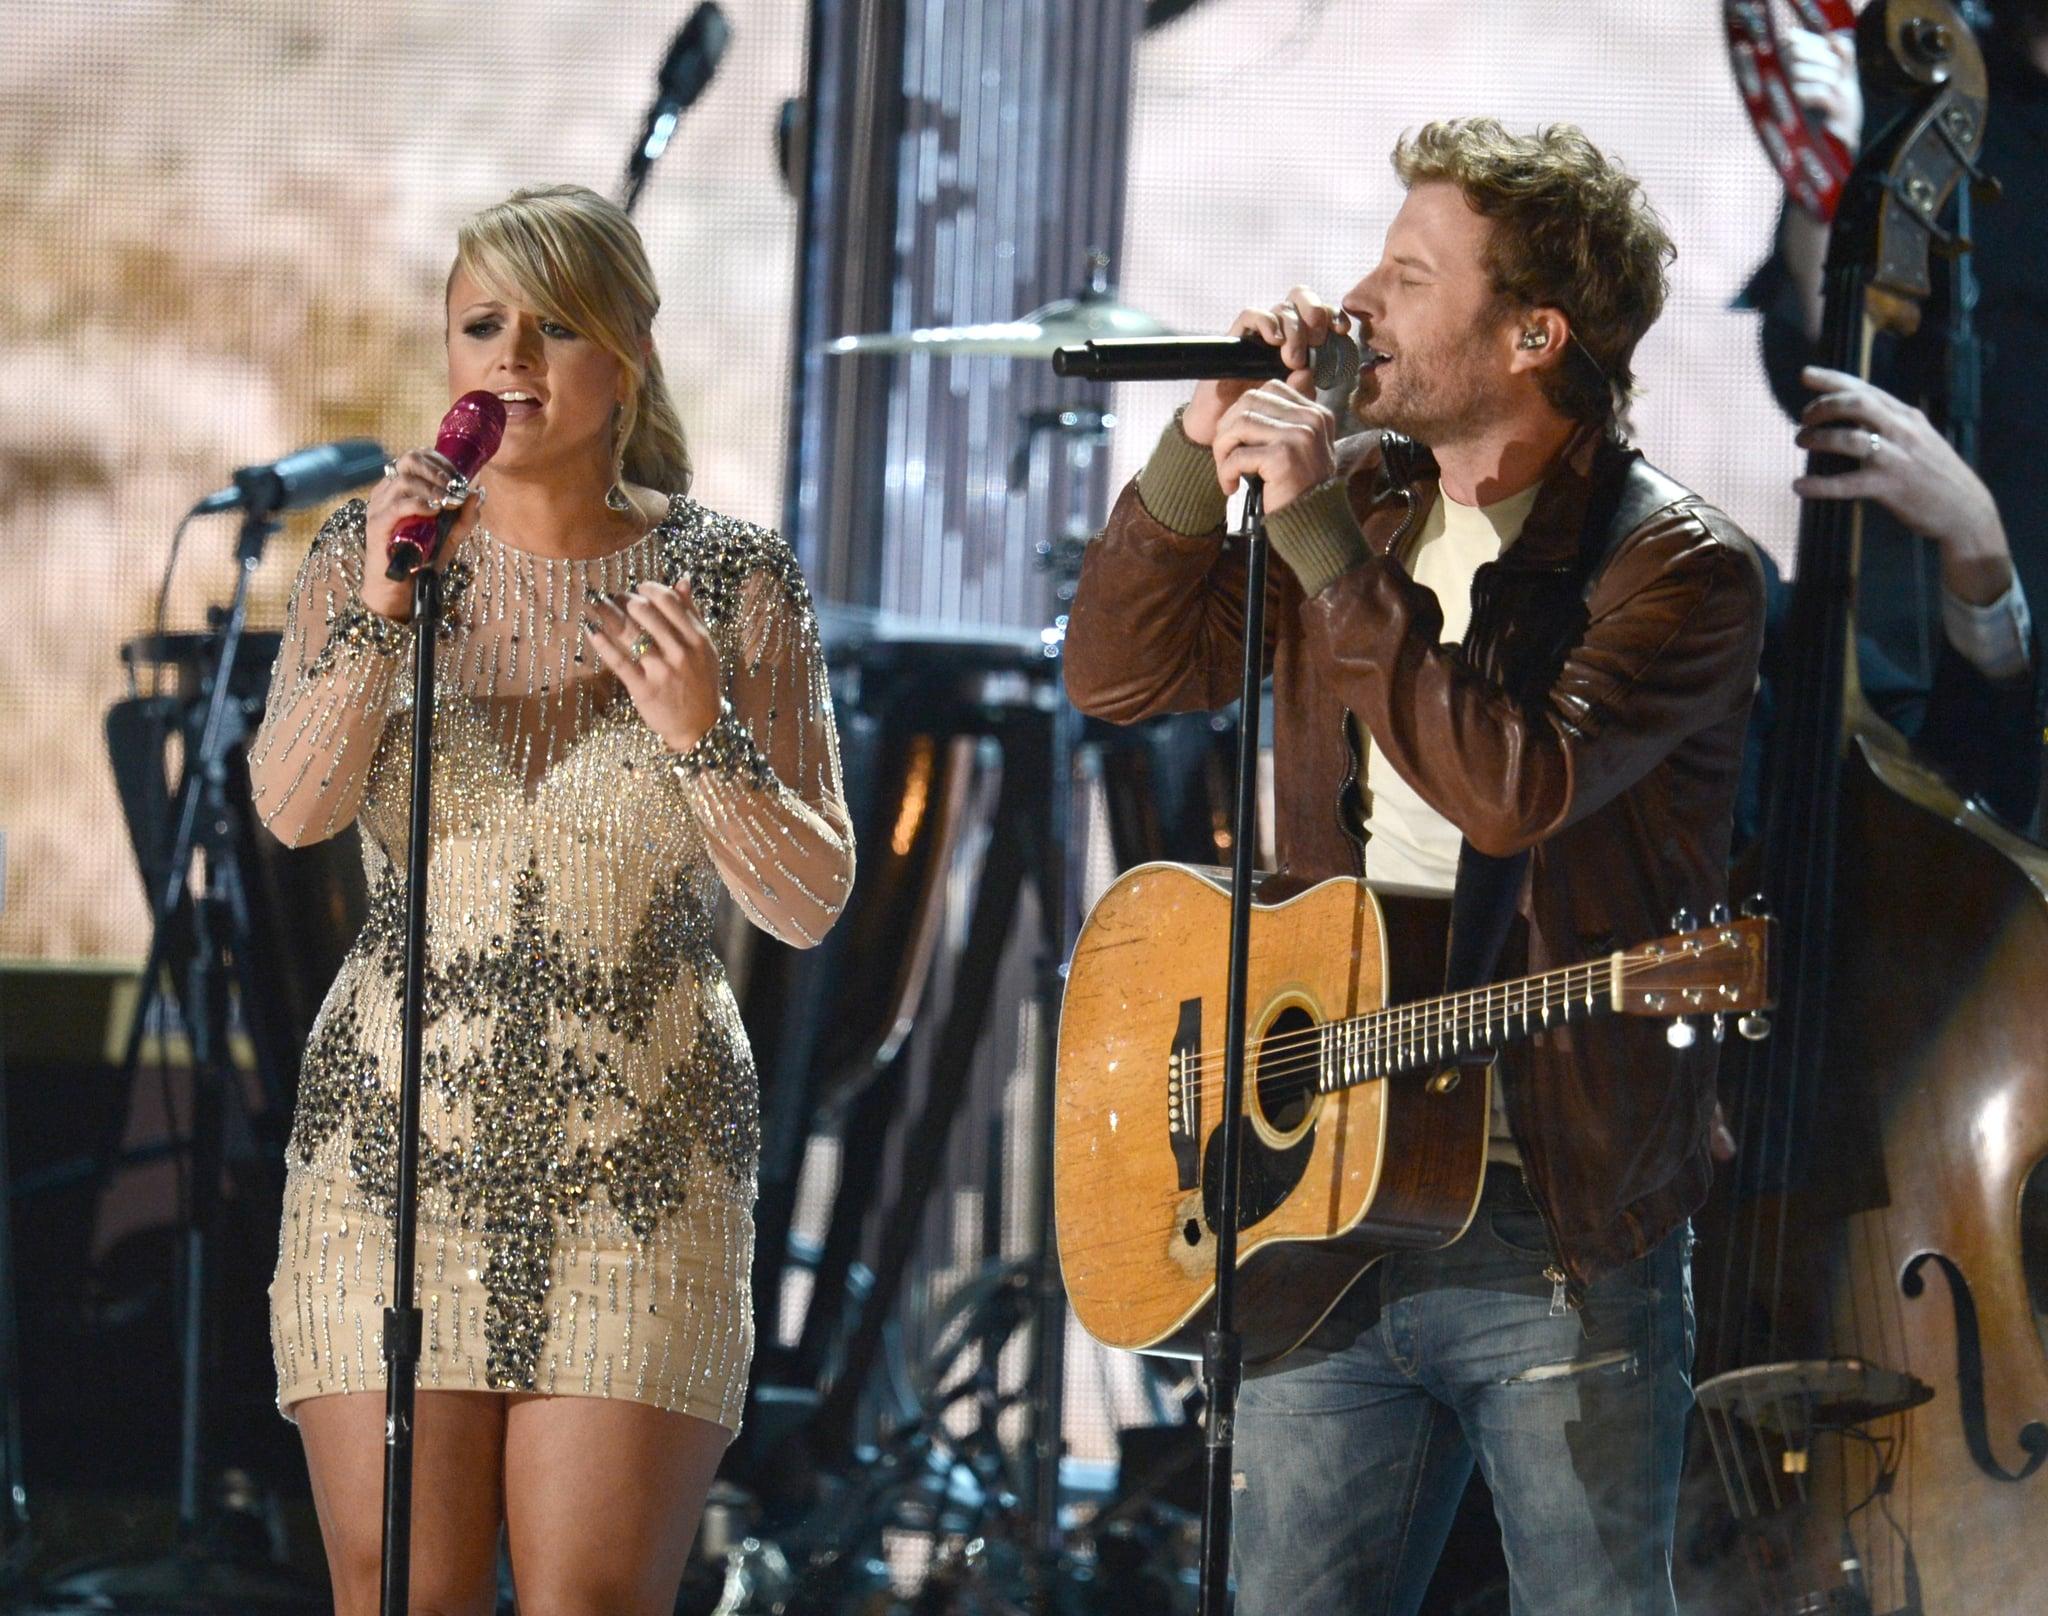 Dierks Bentley and Miranda Lambert took the stage together.